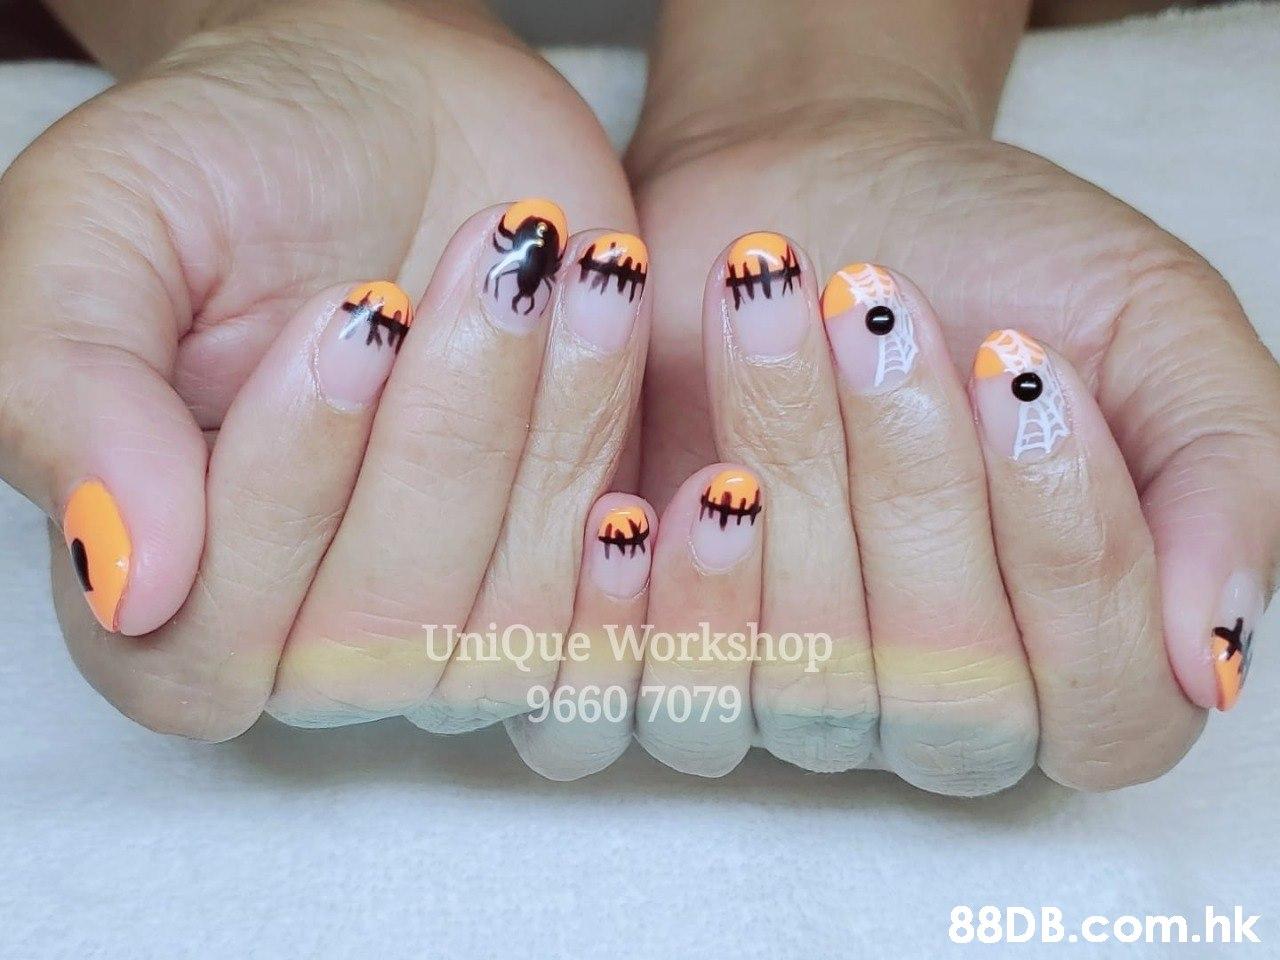 UniQue Workshop 9660 7079 .hk  Nail,Finger,Nail care,Manicure,Nail polish